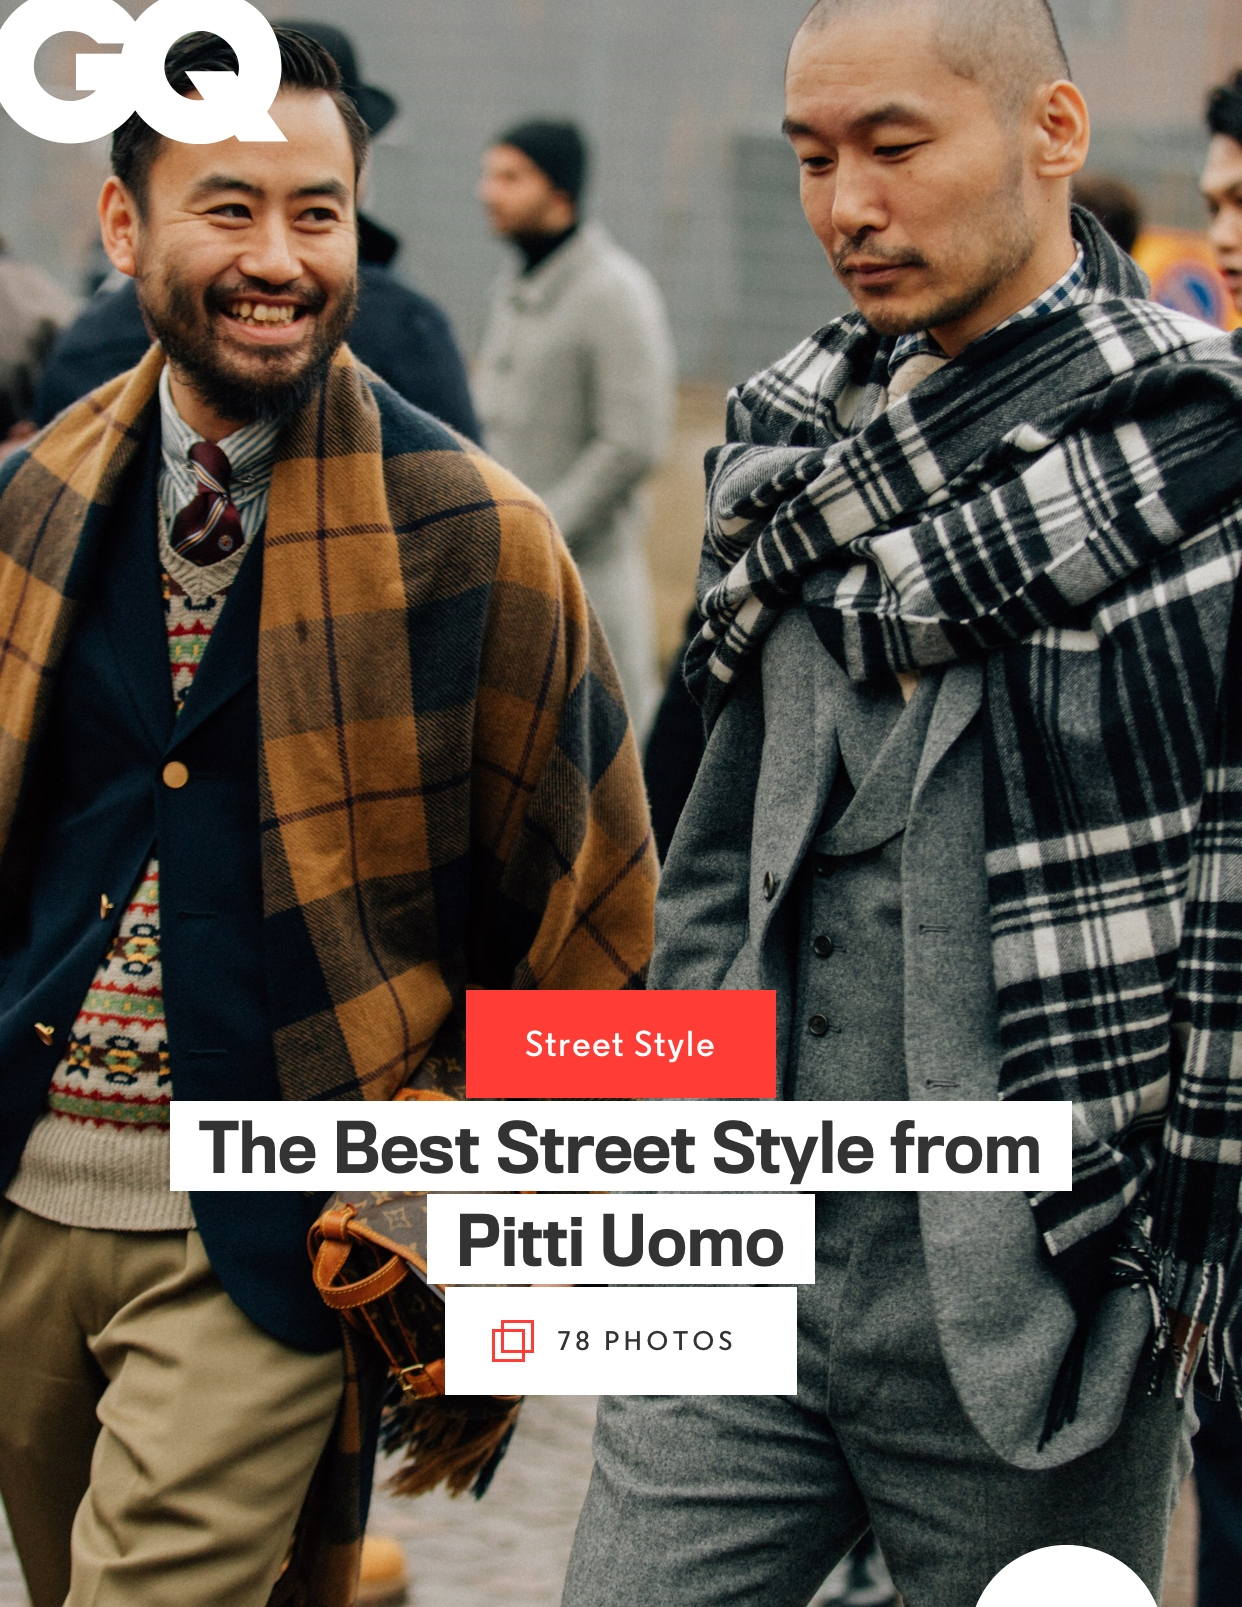 GQ's Pitti Uomo 93 Street Style